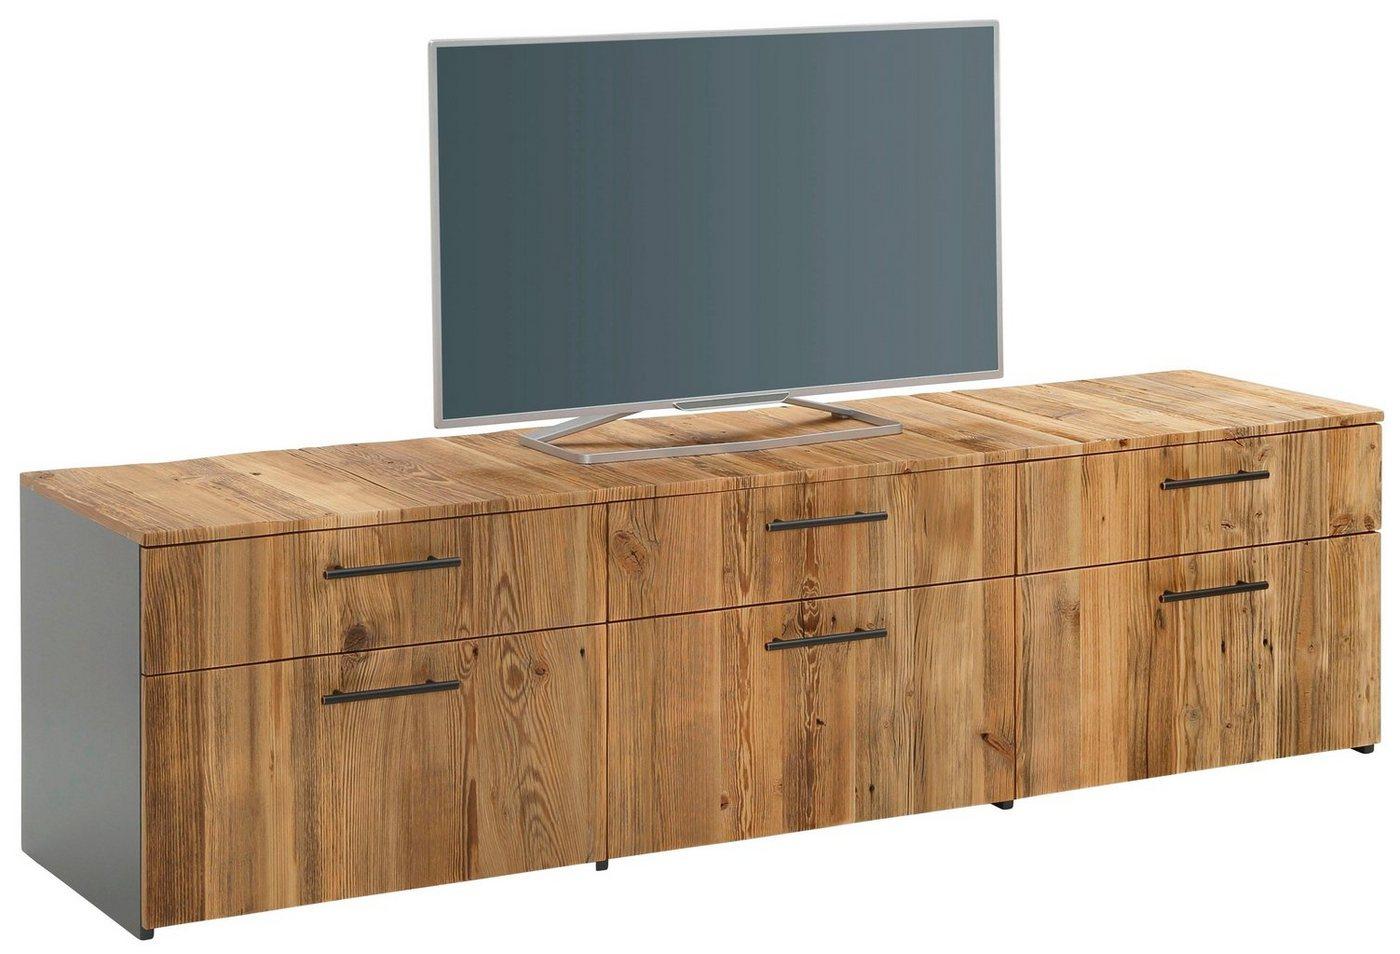 TV Möbel - Premium collection by Home affaire Lowboard »ReLine«, Breite 192 cm  - Onlineshop OTTO